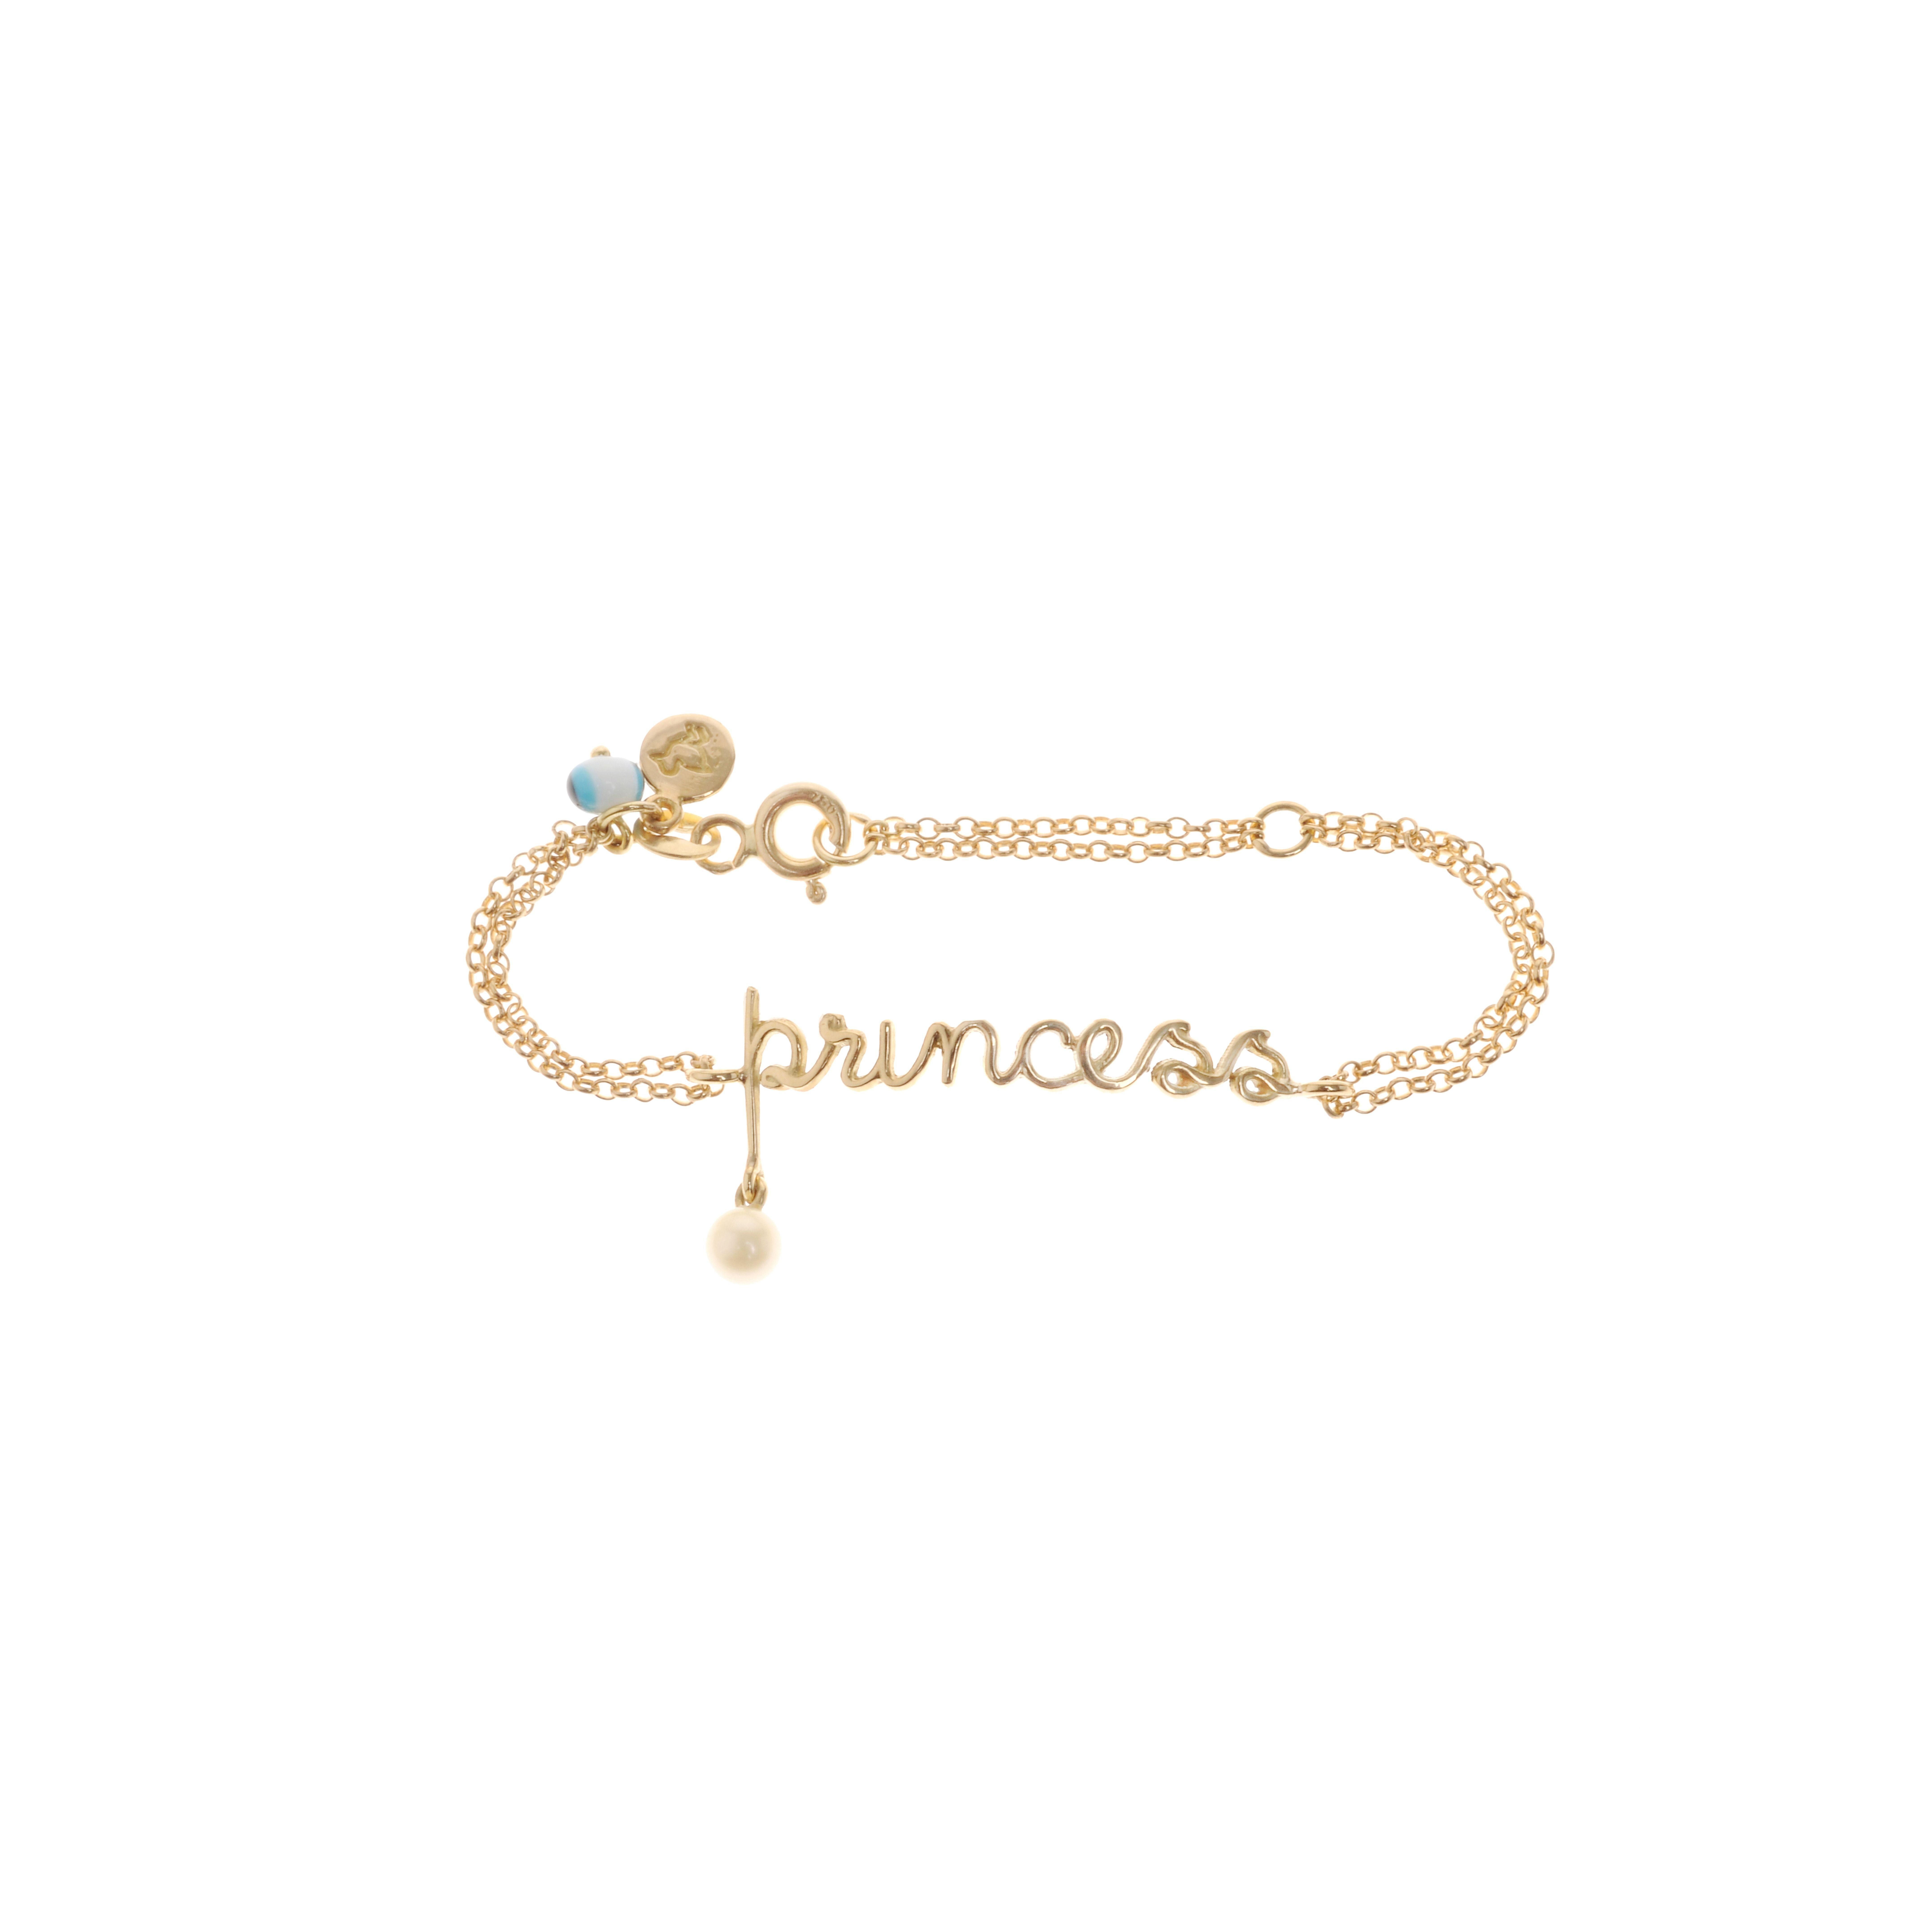 b744acfb832 pulseira princess pérola e ouro 18k   princess bracelet pearl